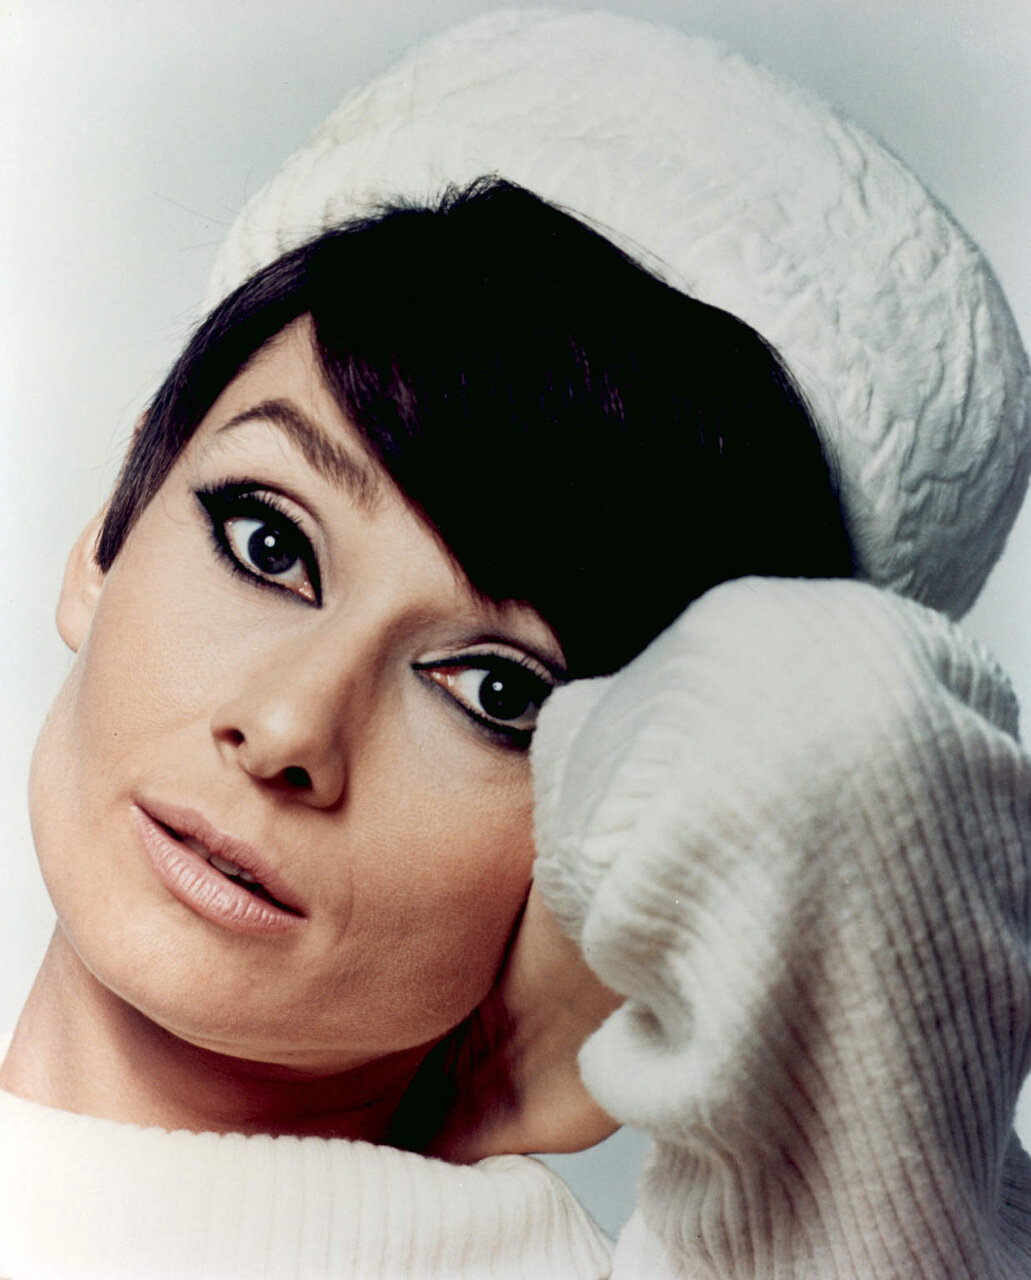 00/00/0000. File pictures of Audrey Hepburn